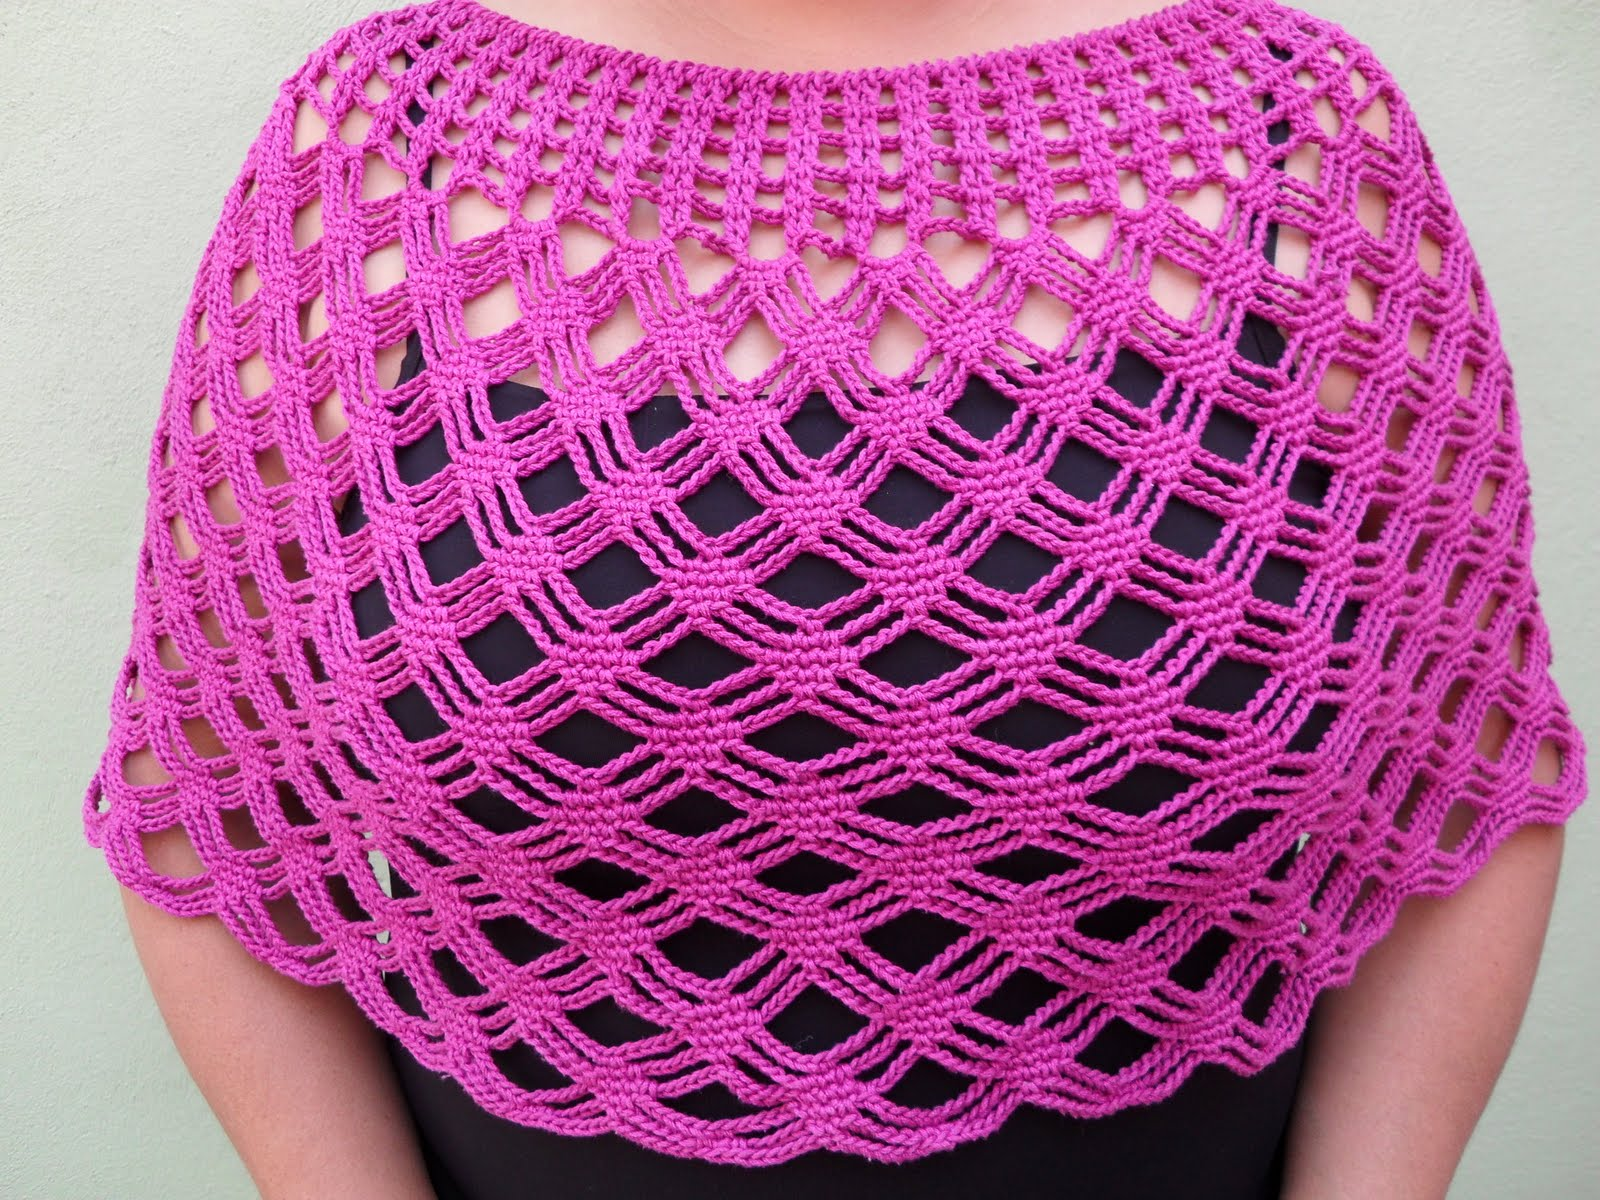 ADICCION CROCHET: capas a crochet